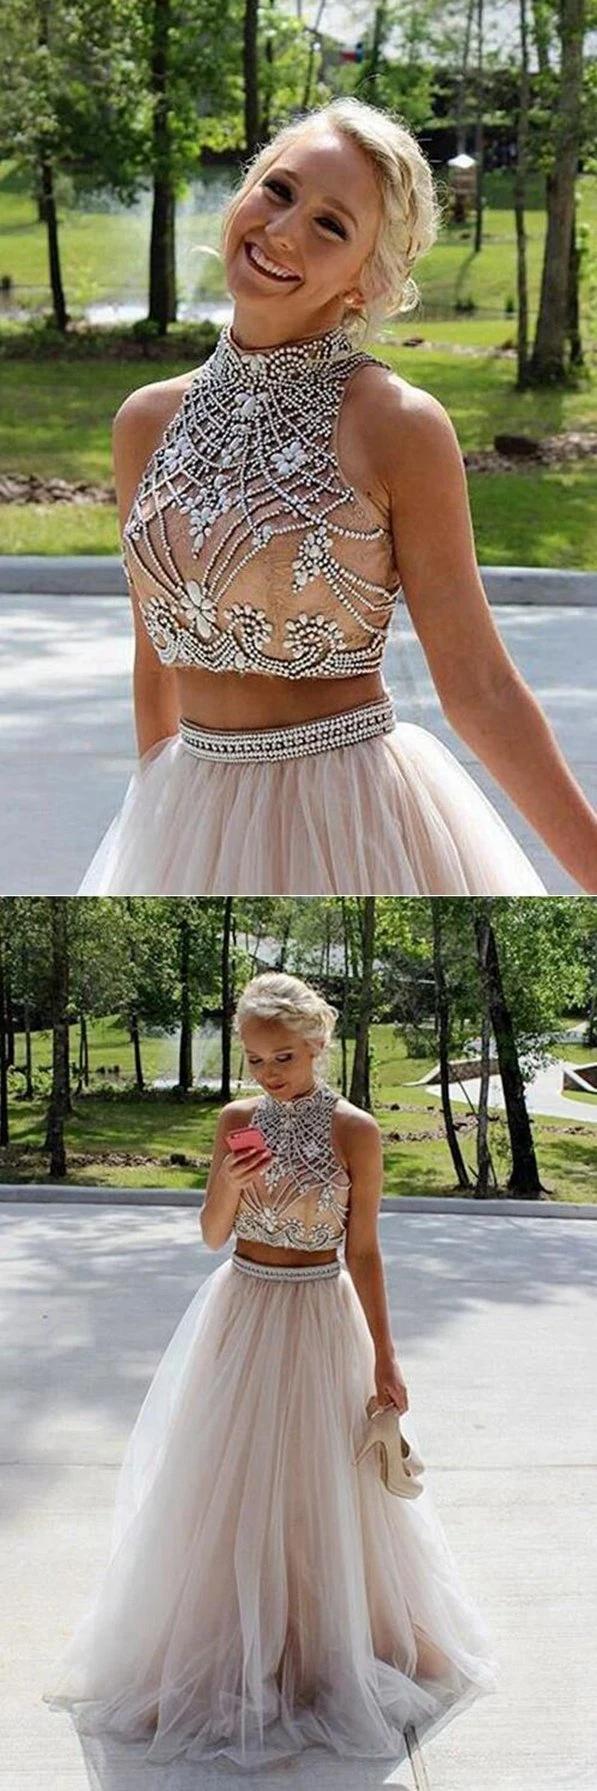 Two Pieces Prom Dresses Halter Neckline Evening Dress Winter Formal In 2021 Halter Prom Dresses Piece Prom Dress Prom Dresses [ 1791 x 597 Pixel ]